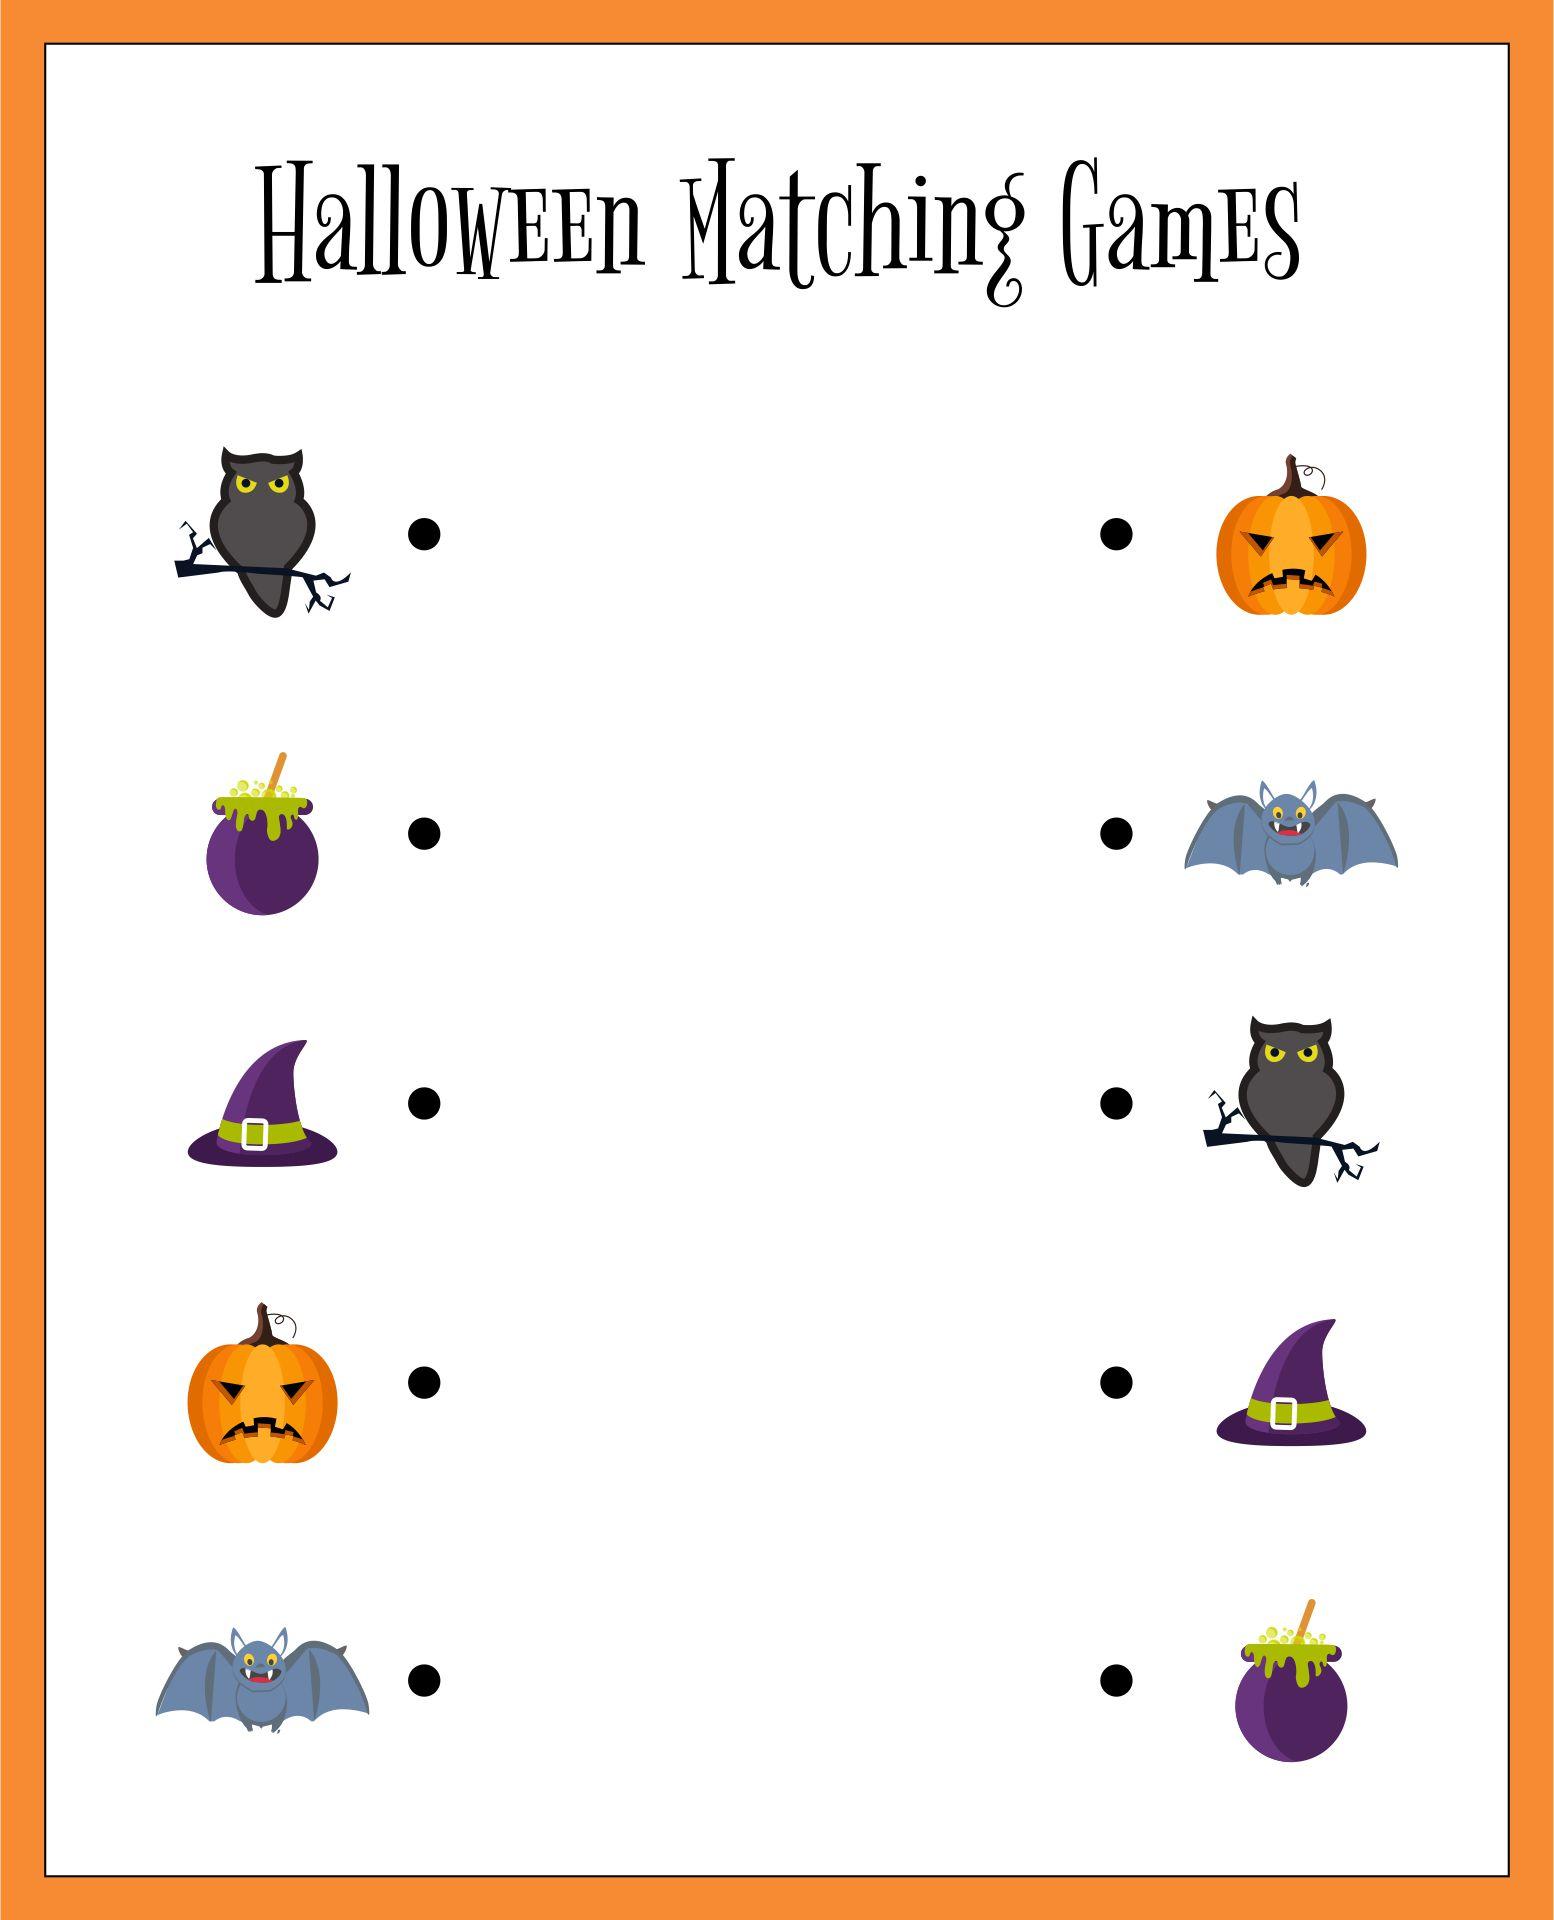 Halloween Matching Games Printable